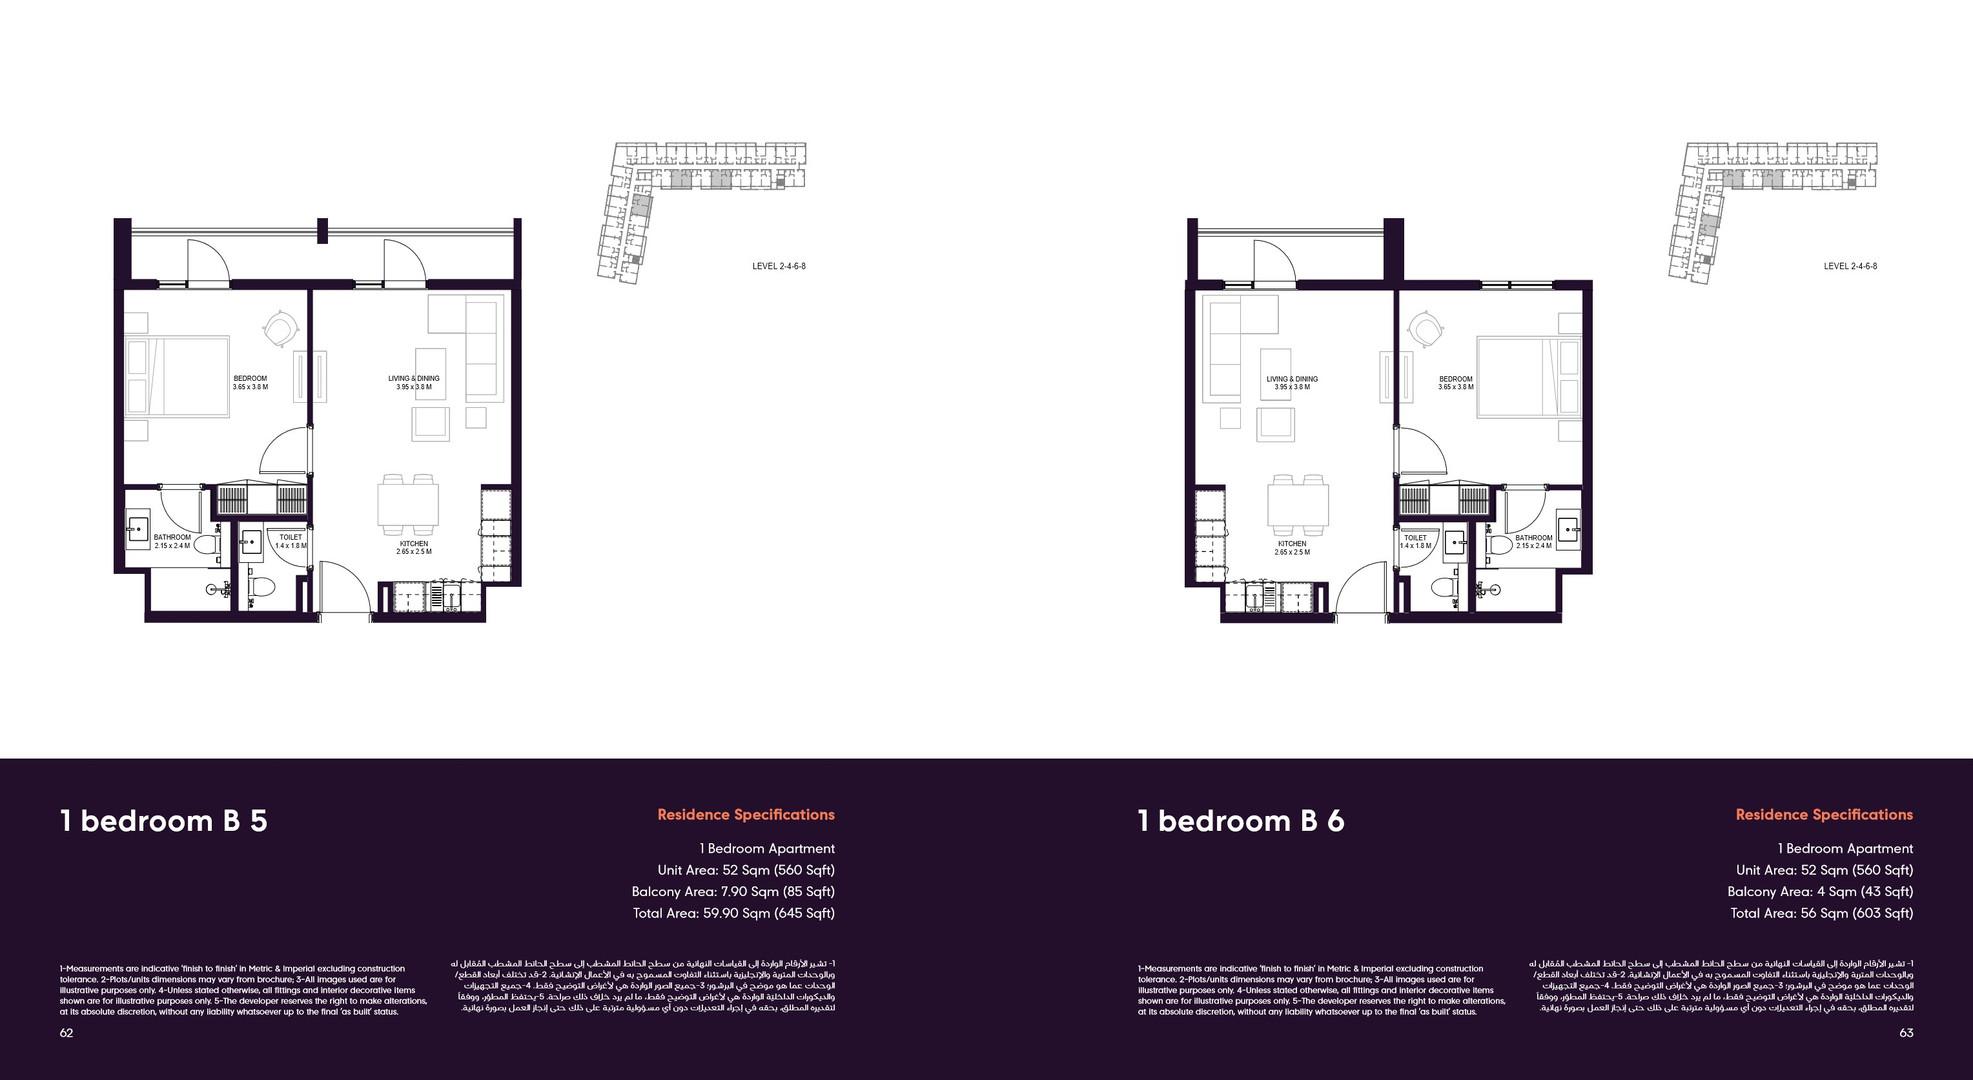 The-Boulevard-2-Brochure_33.jpg